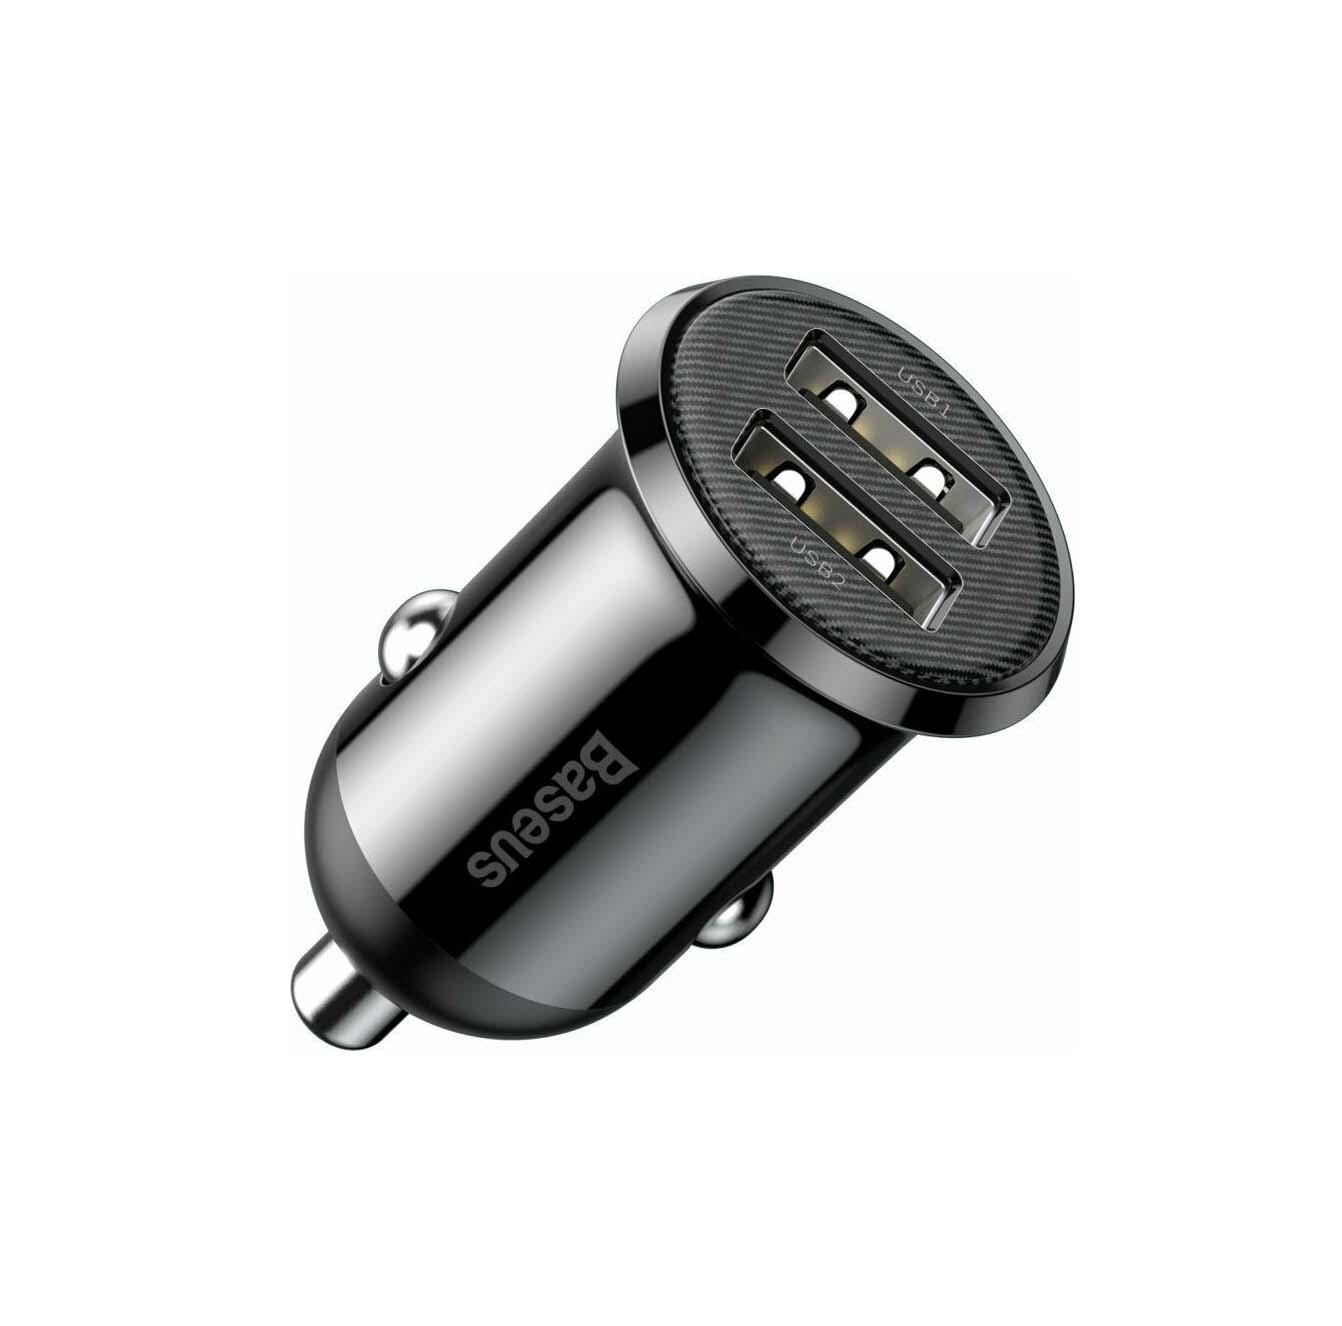 Baseus 4.8A 2x USB Grain Pro CCALLP-01 Φορτιστής Αυτοκινήτου Black